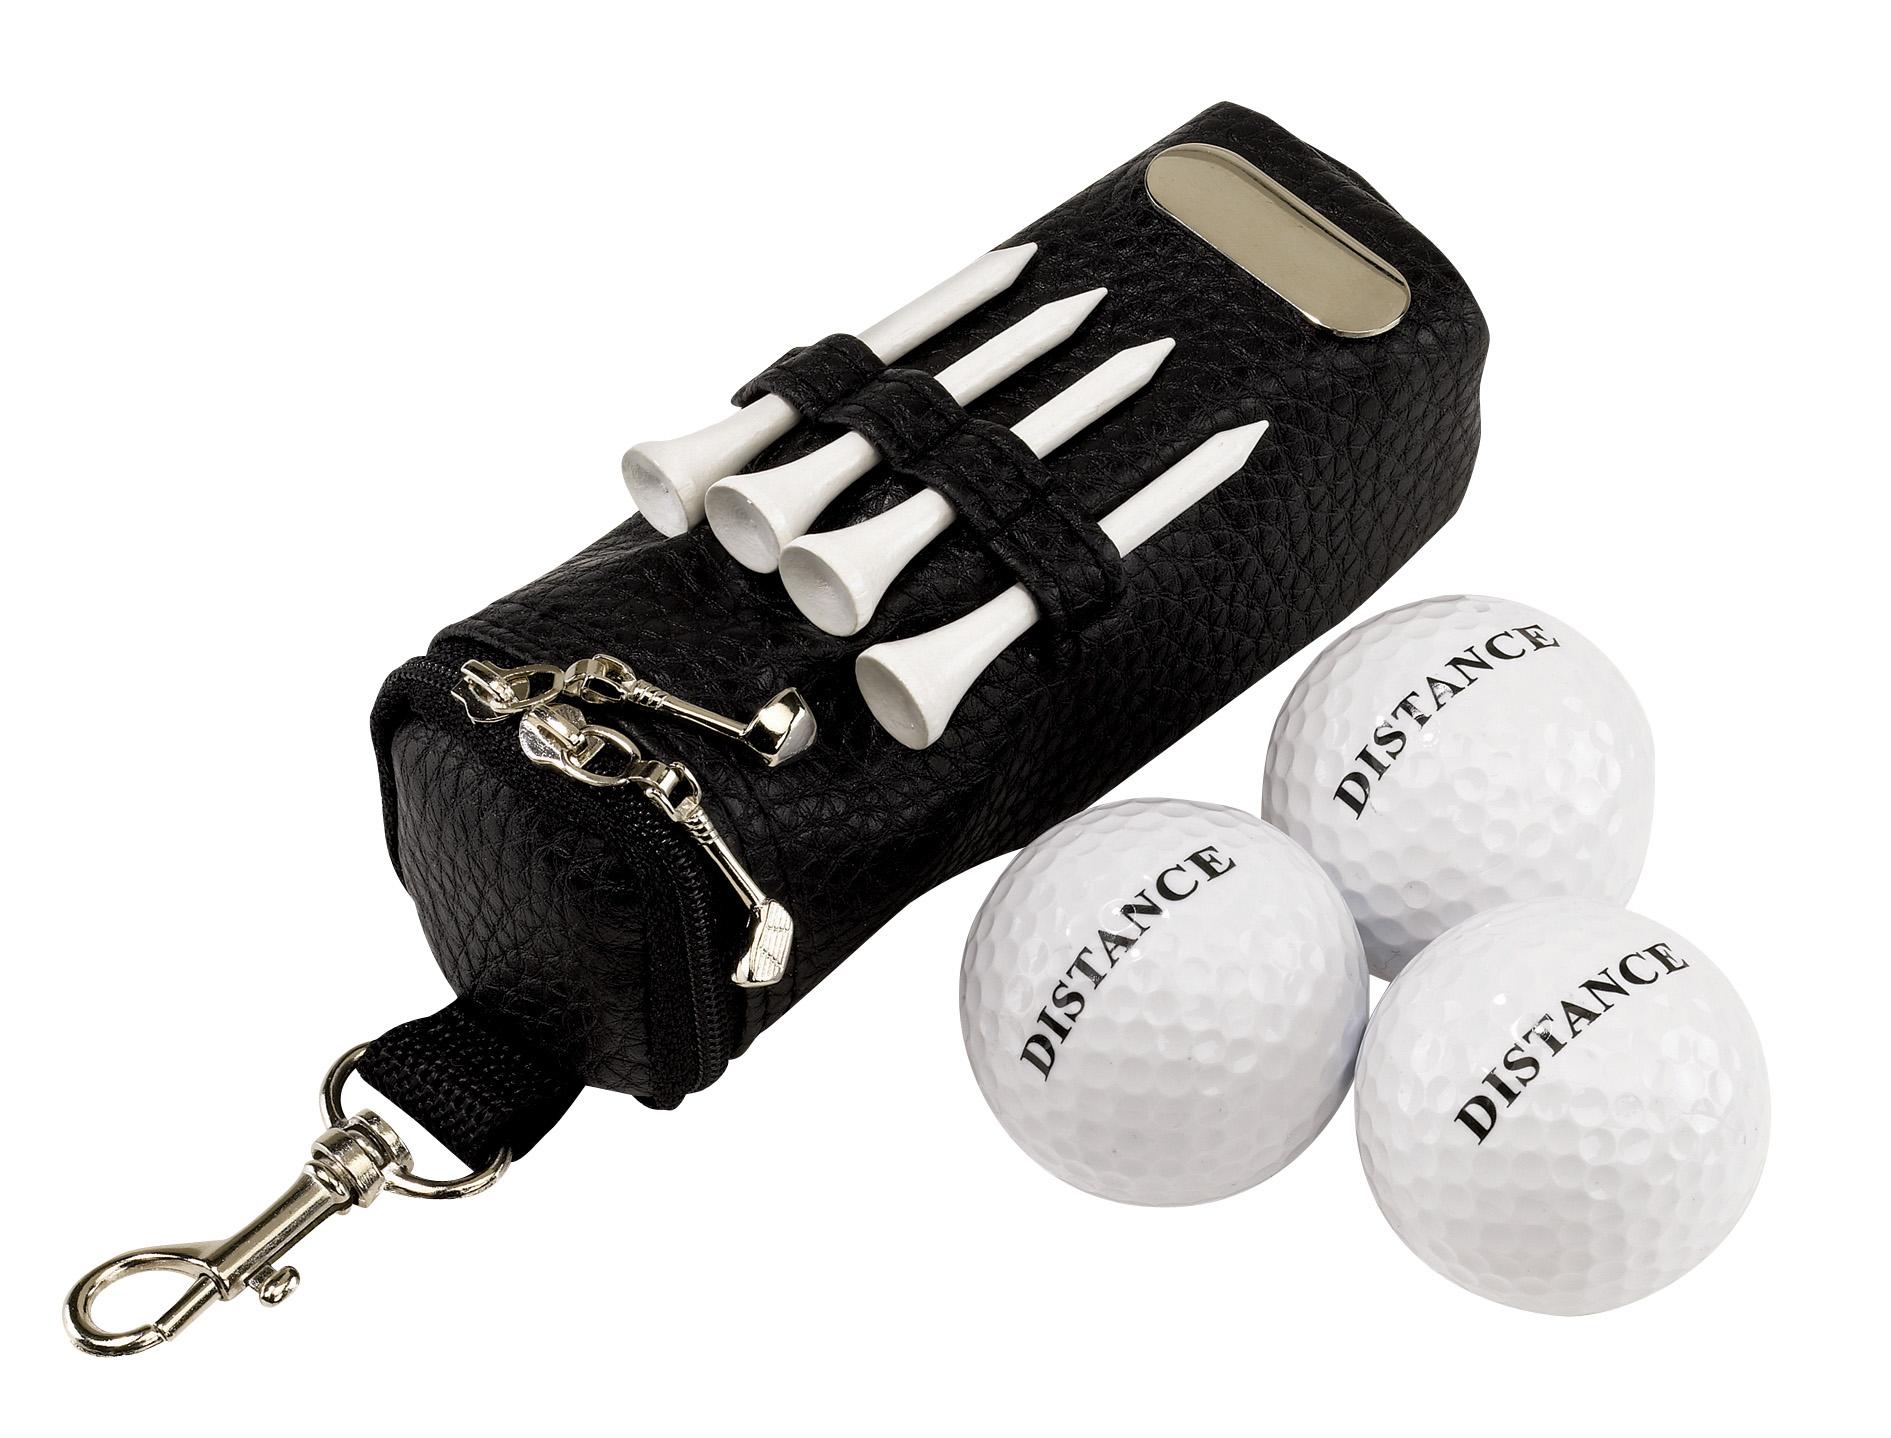 cdo promocionales set de golf portable. Black Bedroom Furniture Sets. Home Design Ideas